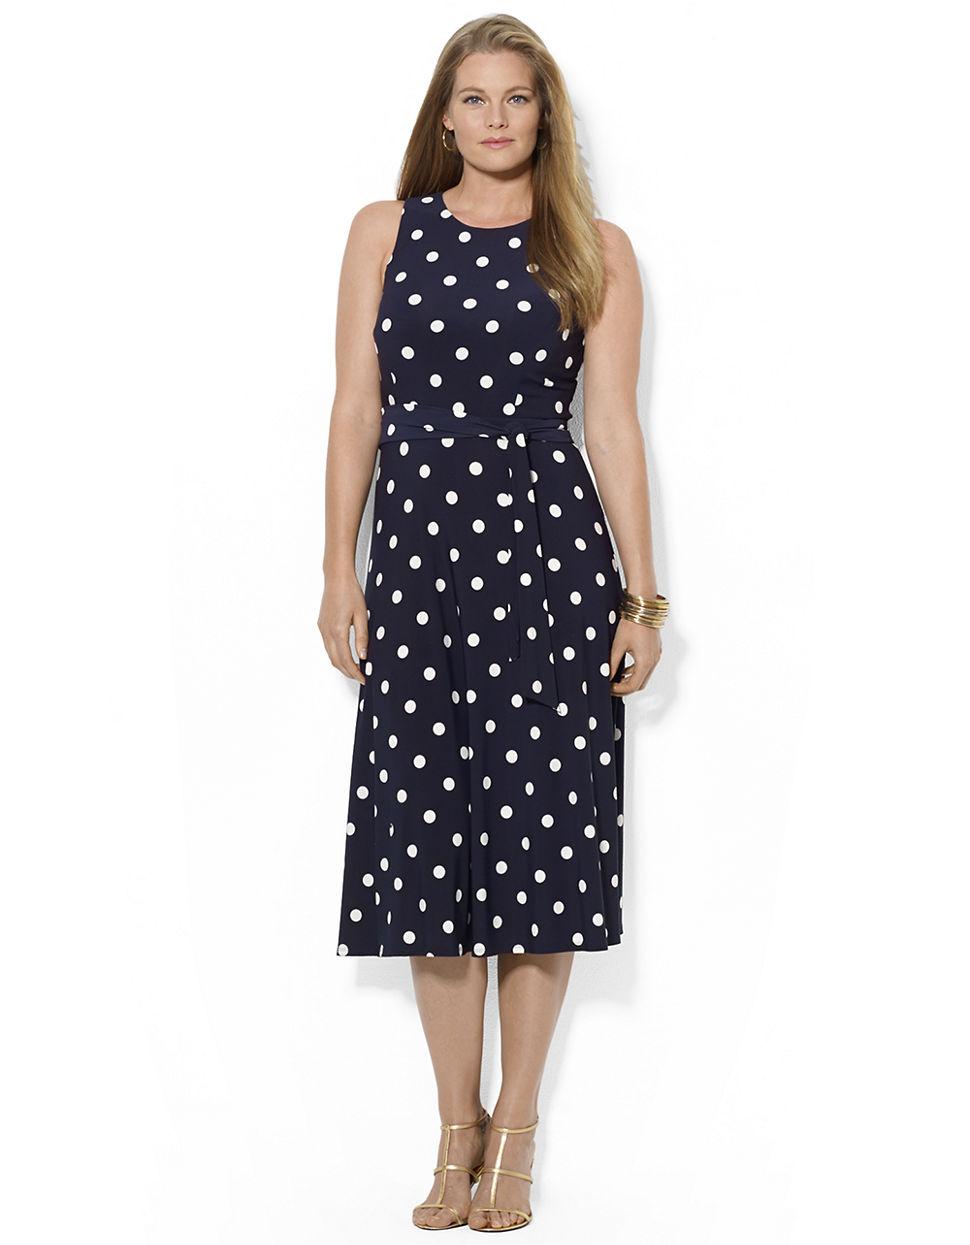 Lauren by Ralph Lauren PolkaDot CapSleeve Dress in Blue